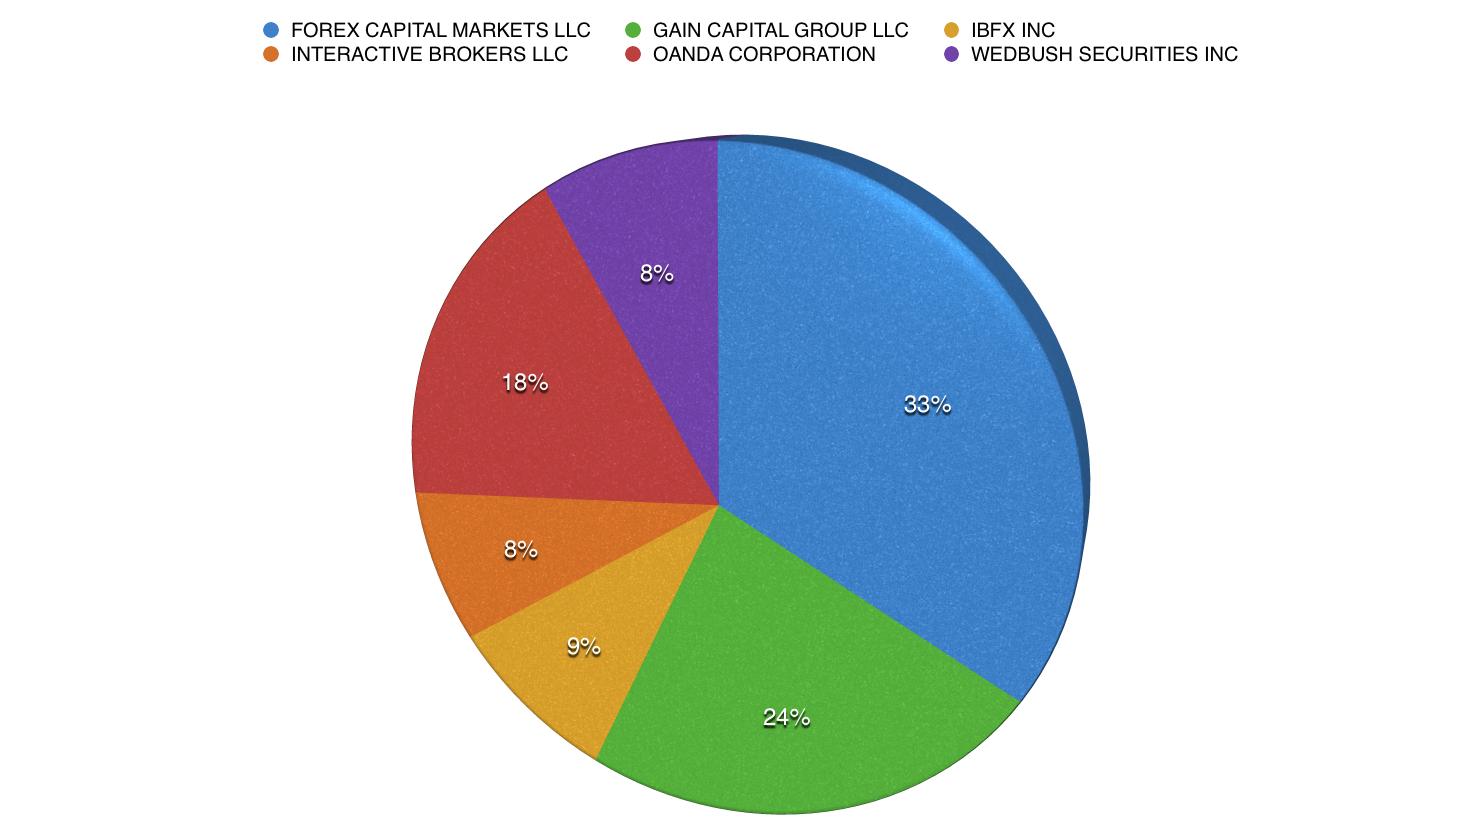 FXCM, GAIN Capital, Interactive Brokers, forex dealers